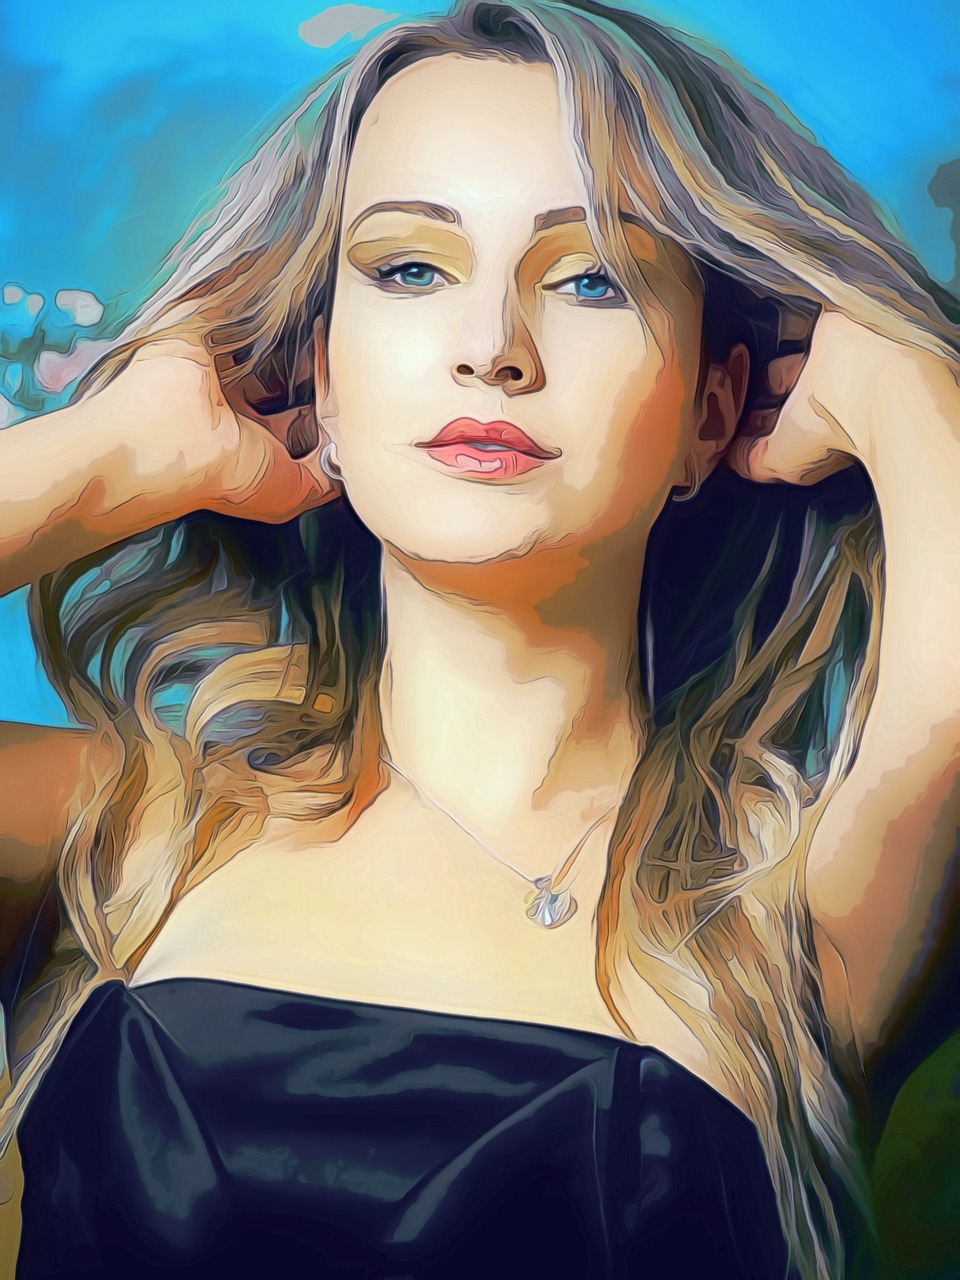 Woman Portrait Appearance - Free image on Pixabay